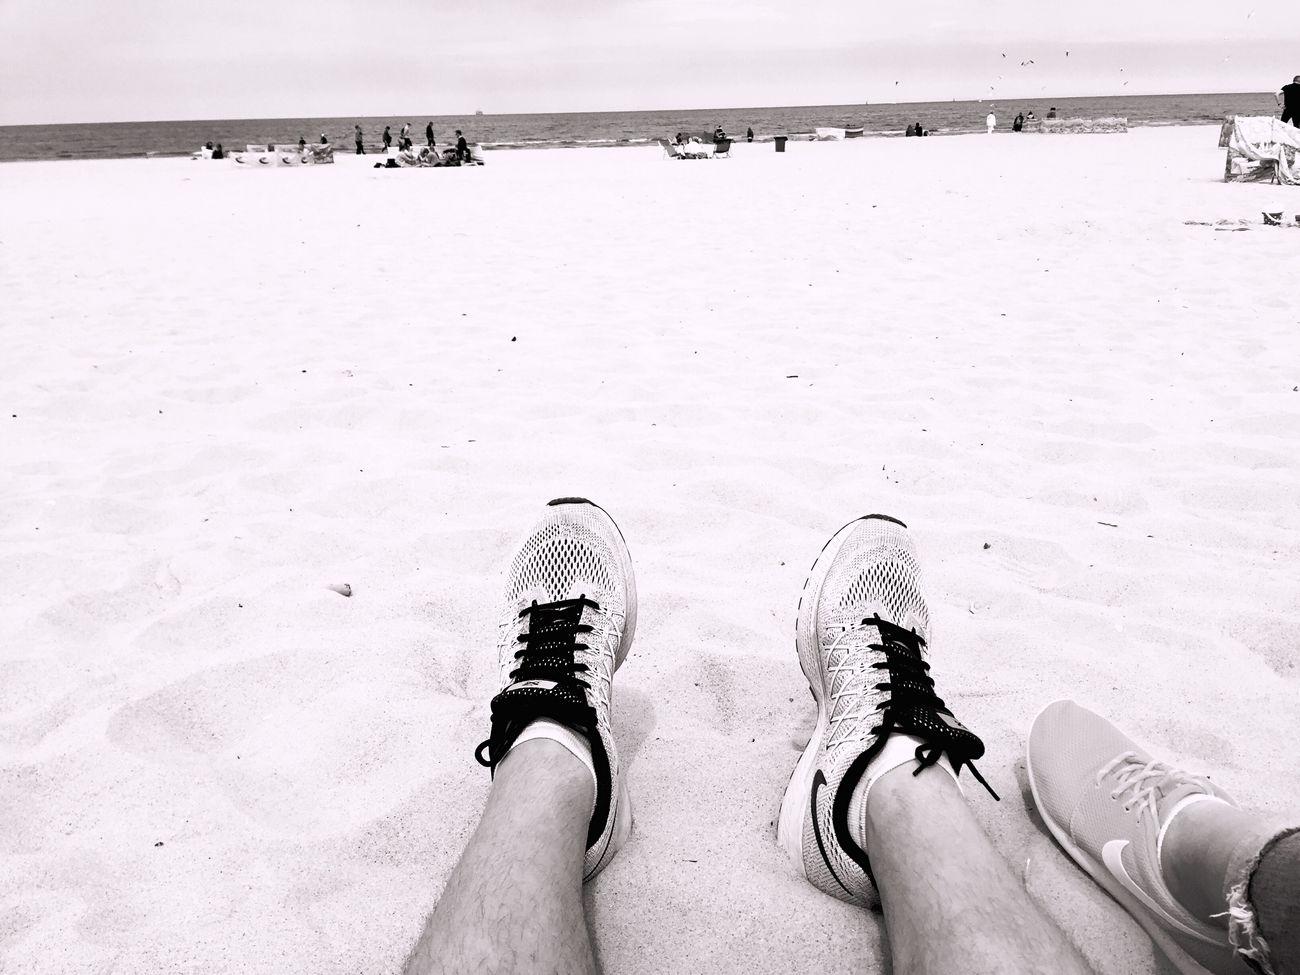 Chillin' Sea Feelsogood First Eyeem Photo